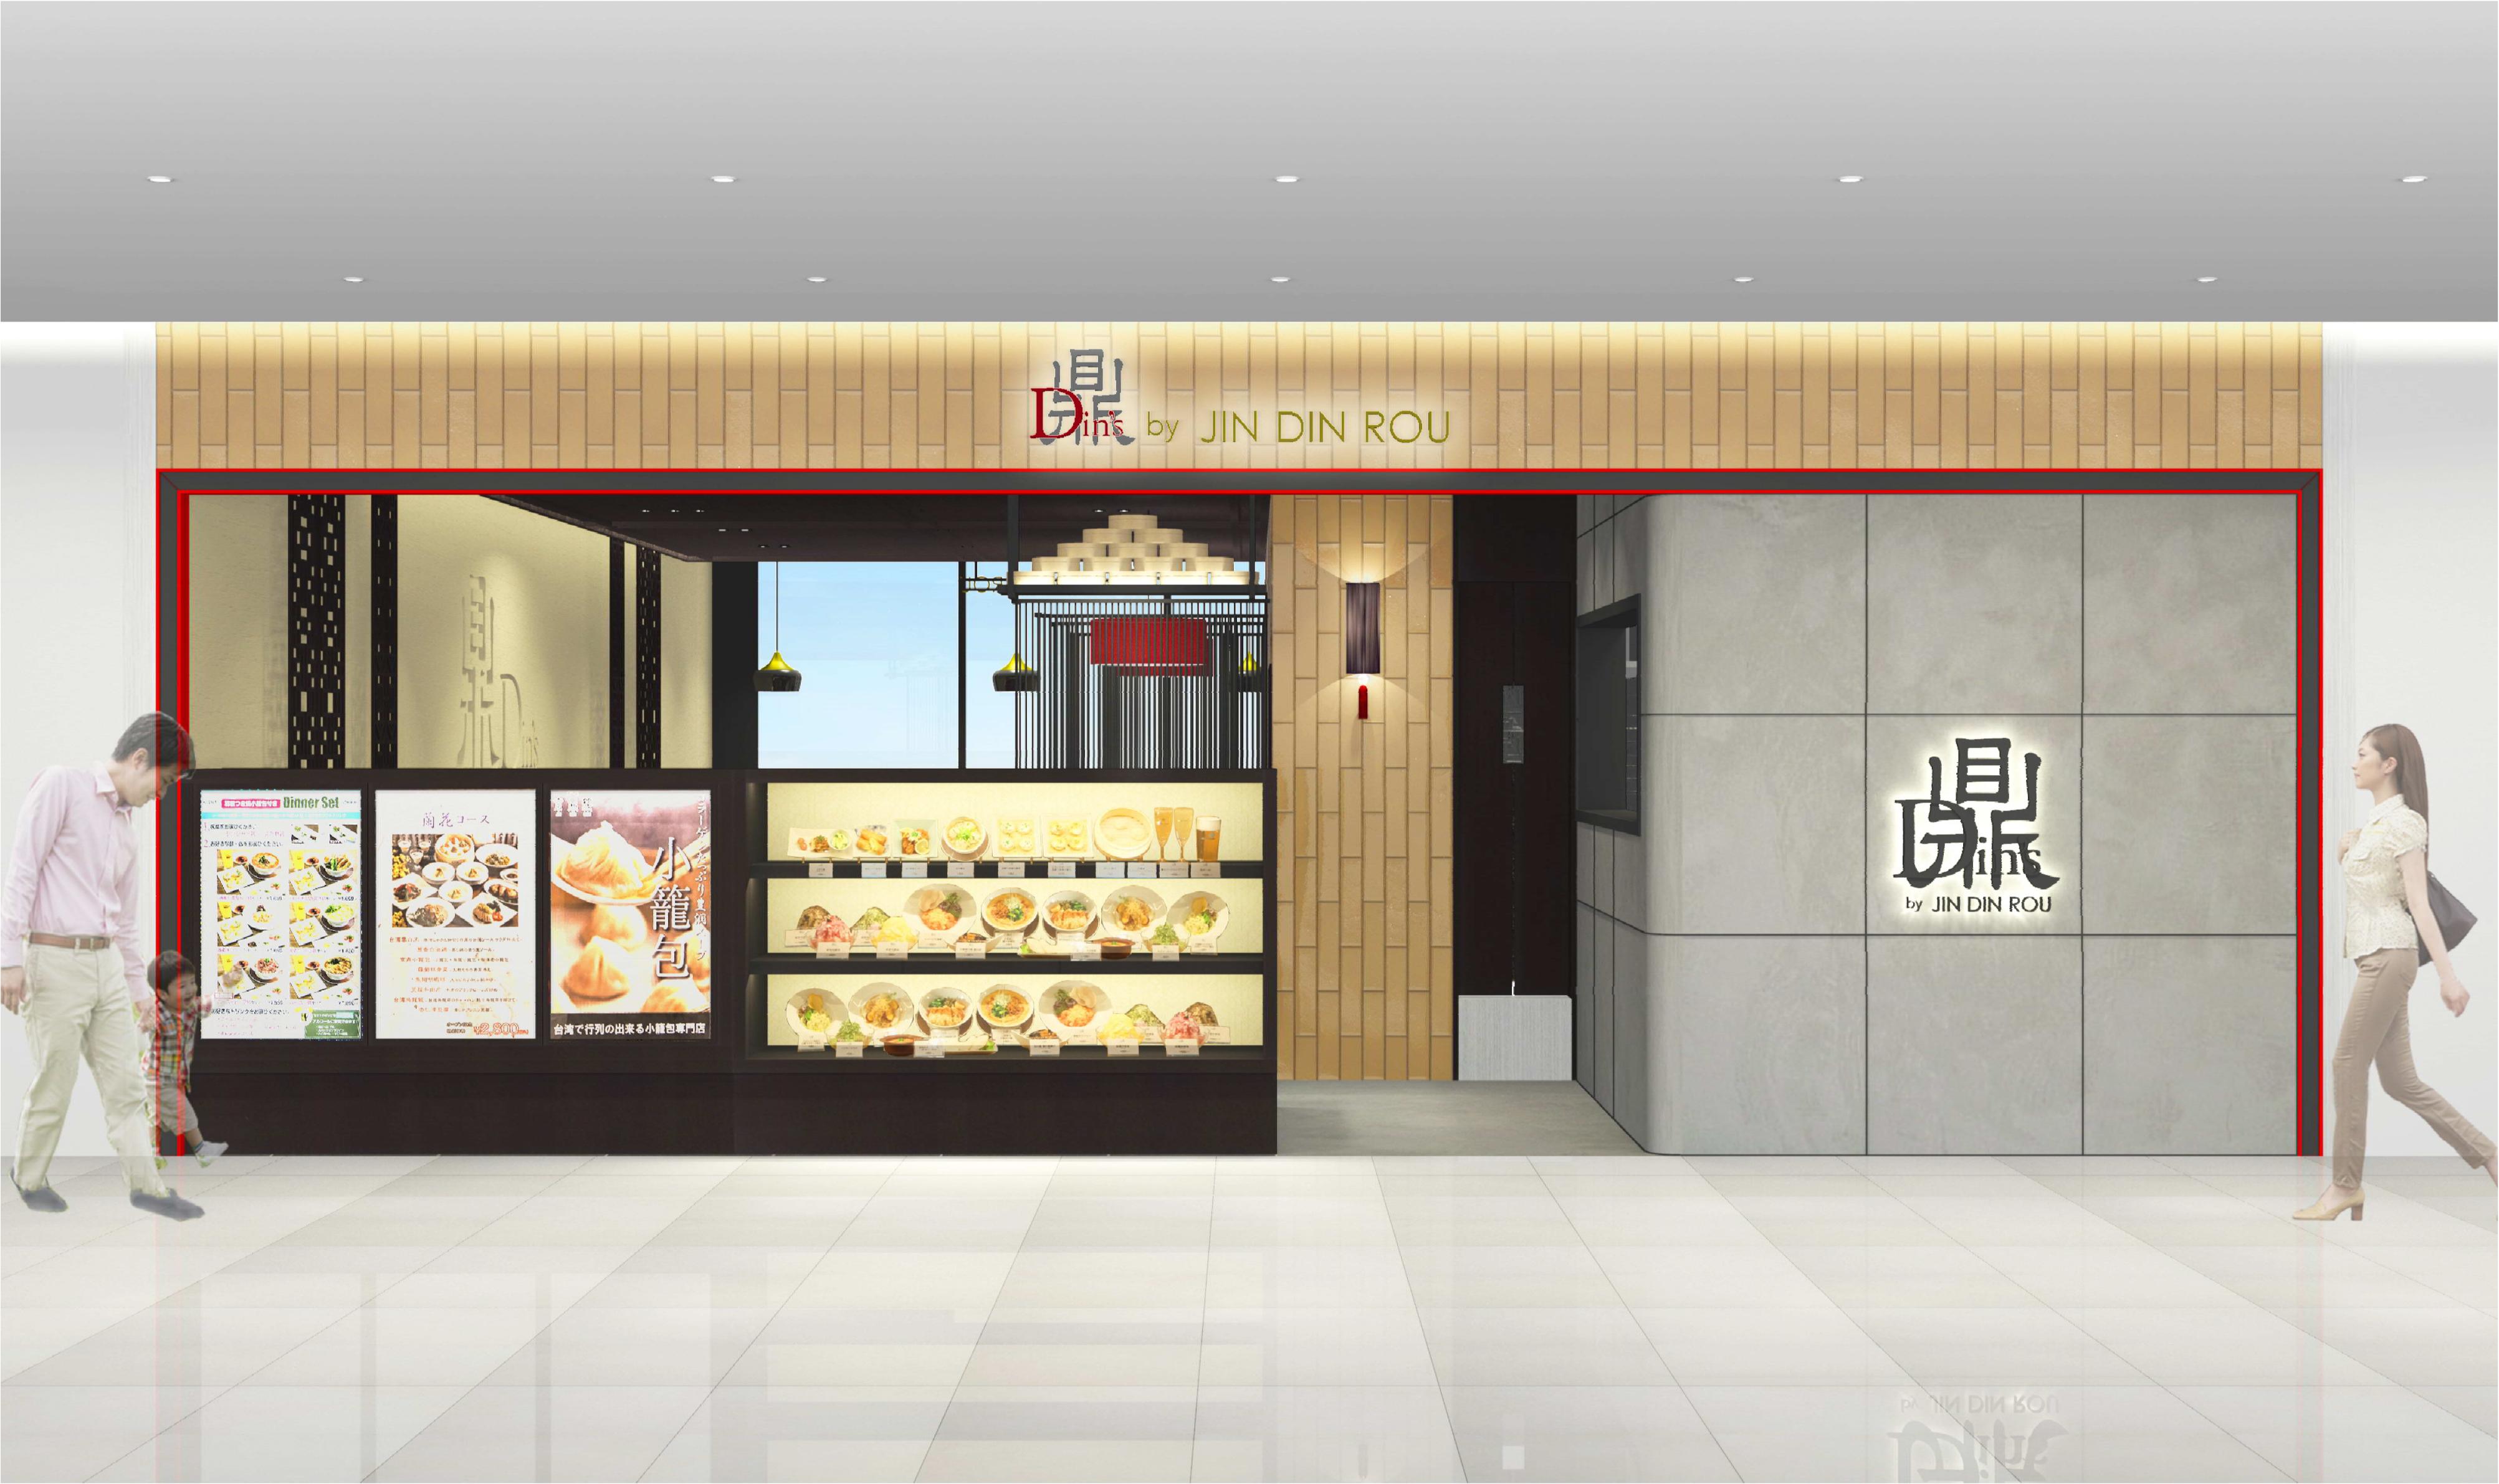 鼎' s by JIN DIN ROU SAKURA MACHI 熊本店が2019年9月14日(土) GRAND OPEN!